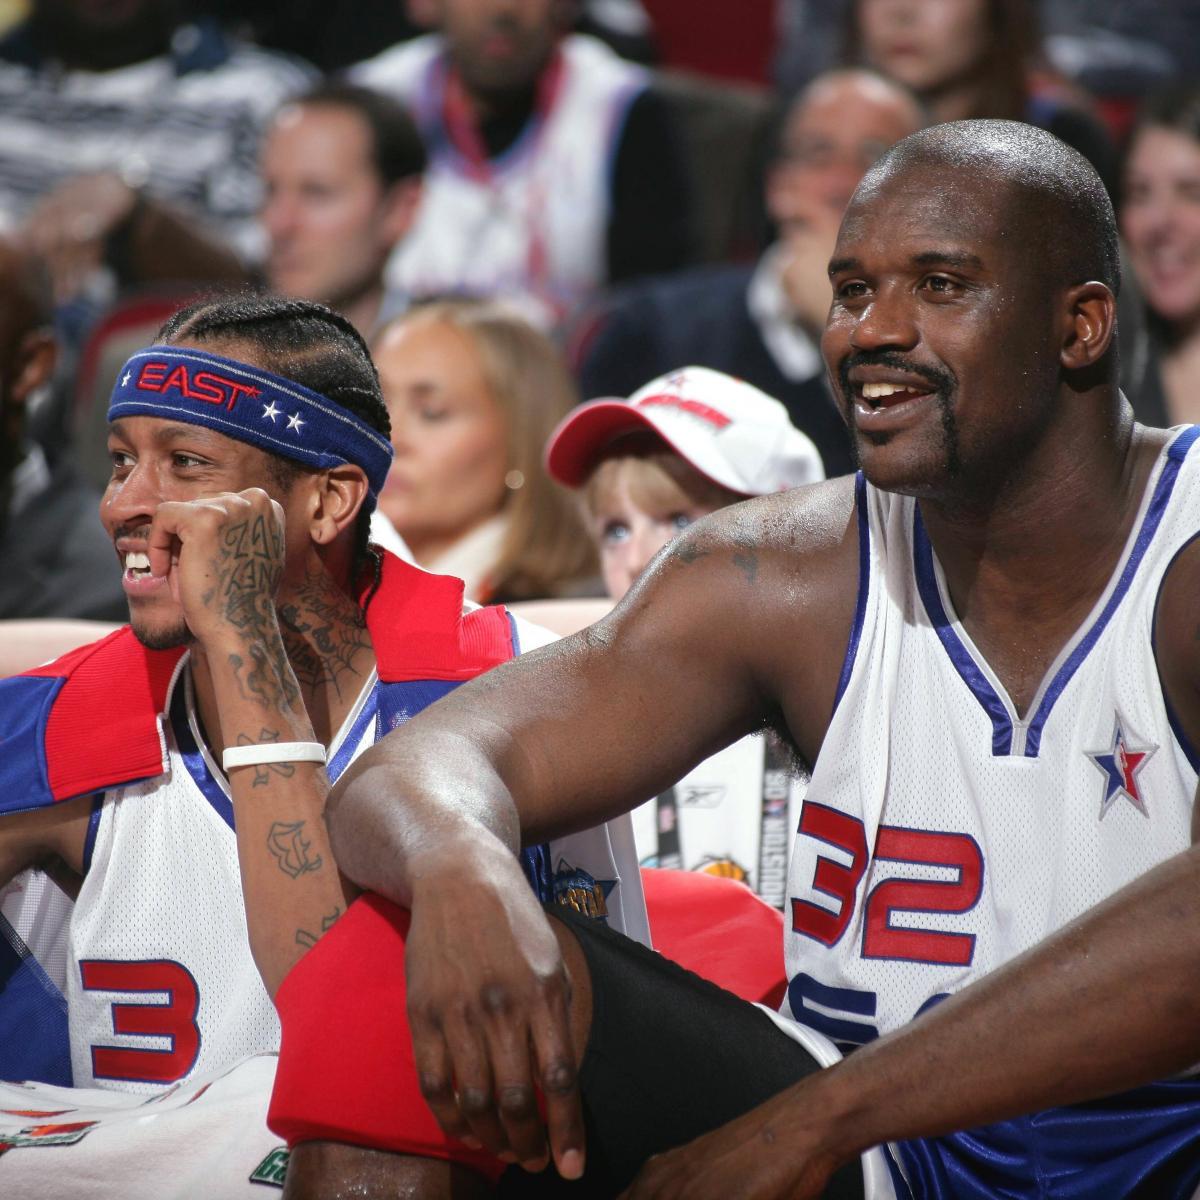 Naismith Basketball Hall Of Fame 2016: List Of Inductees